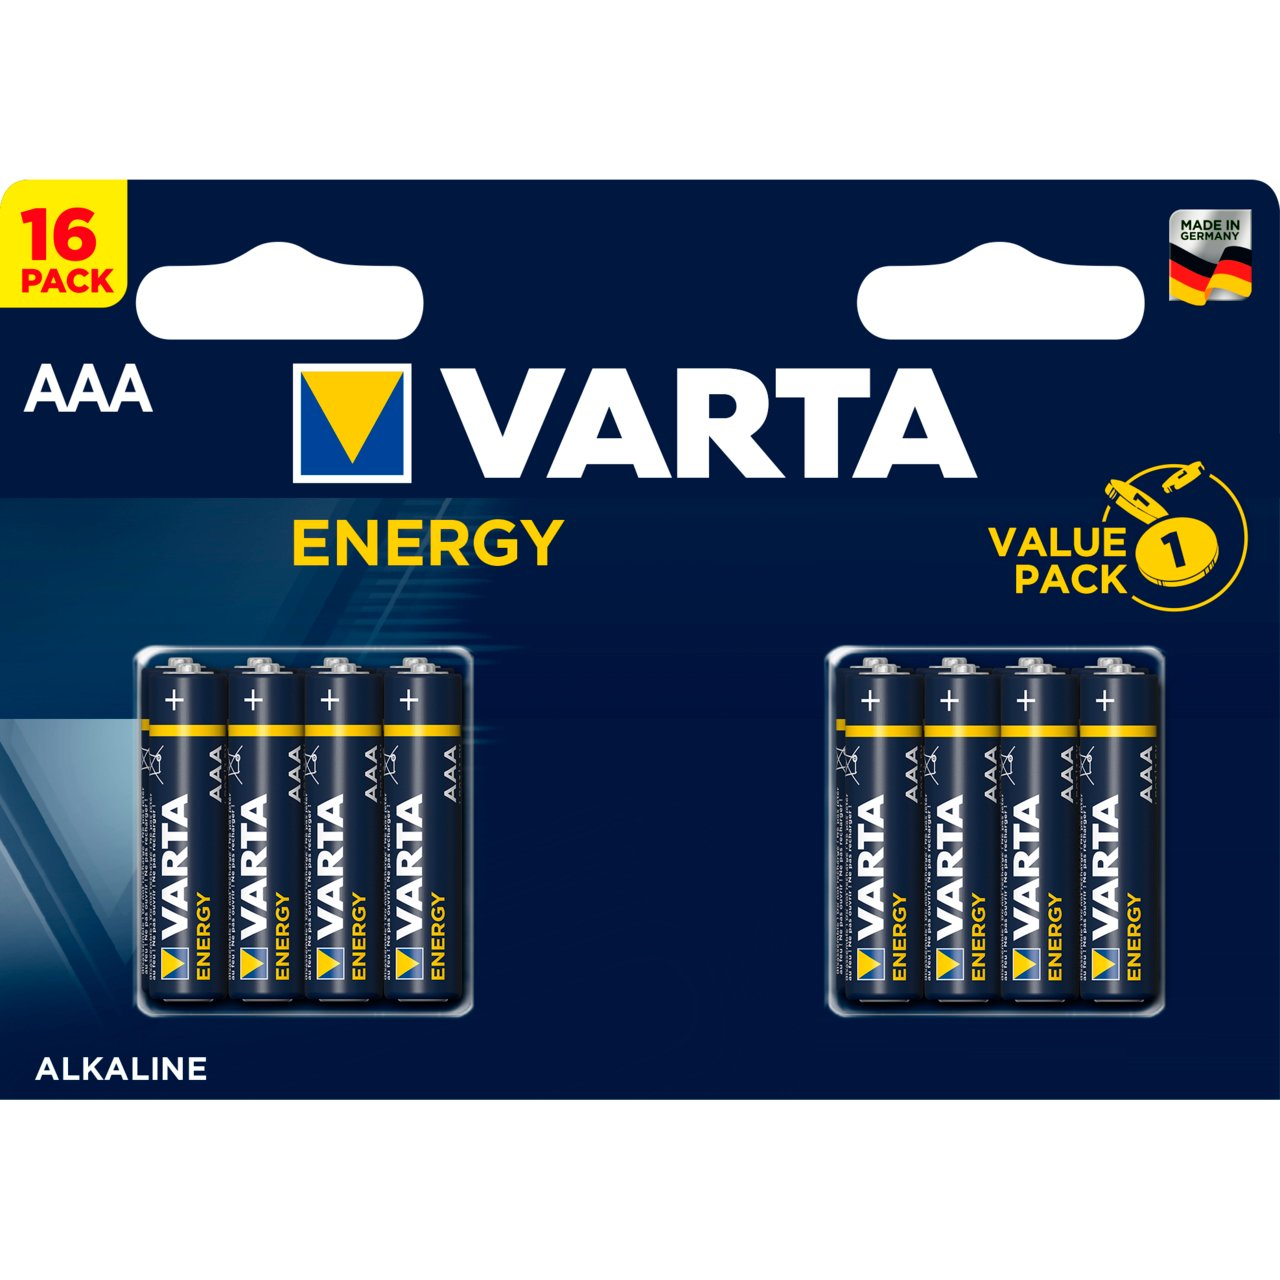 VARTA Energy batteri